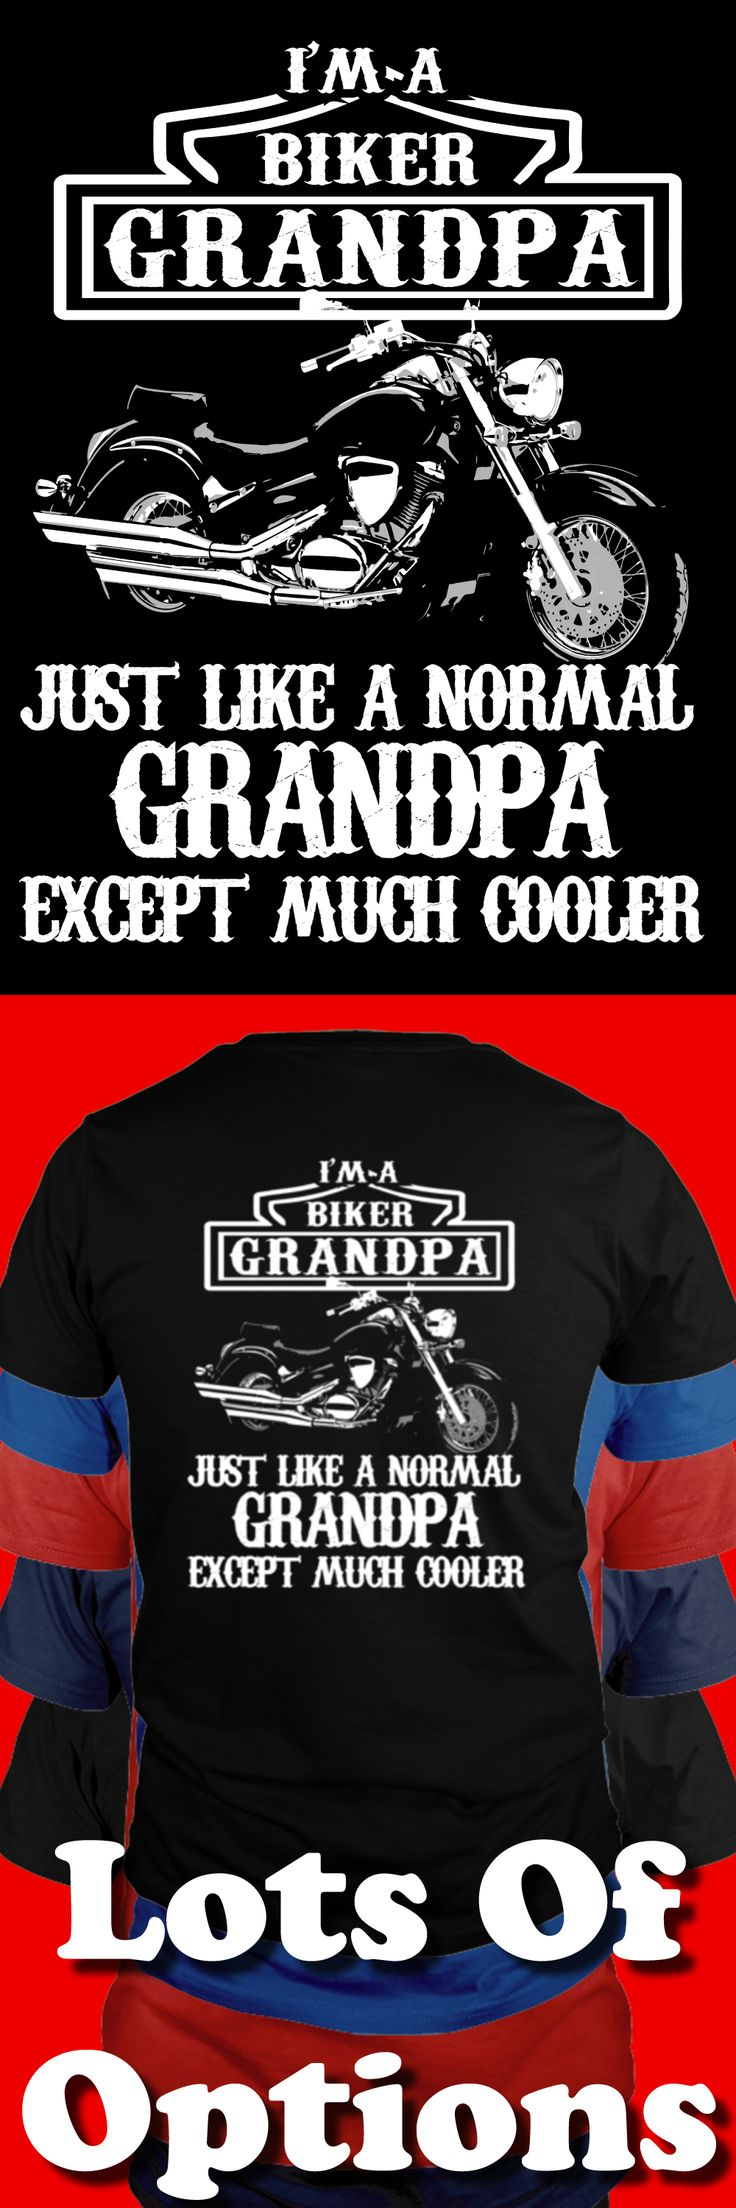 how to wear grandpa shirts on women